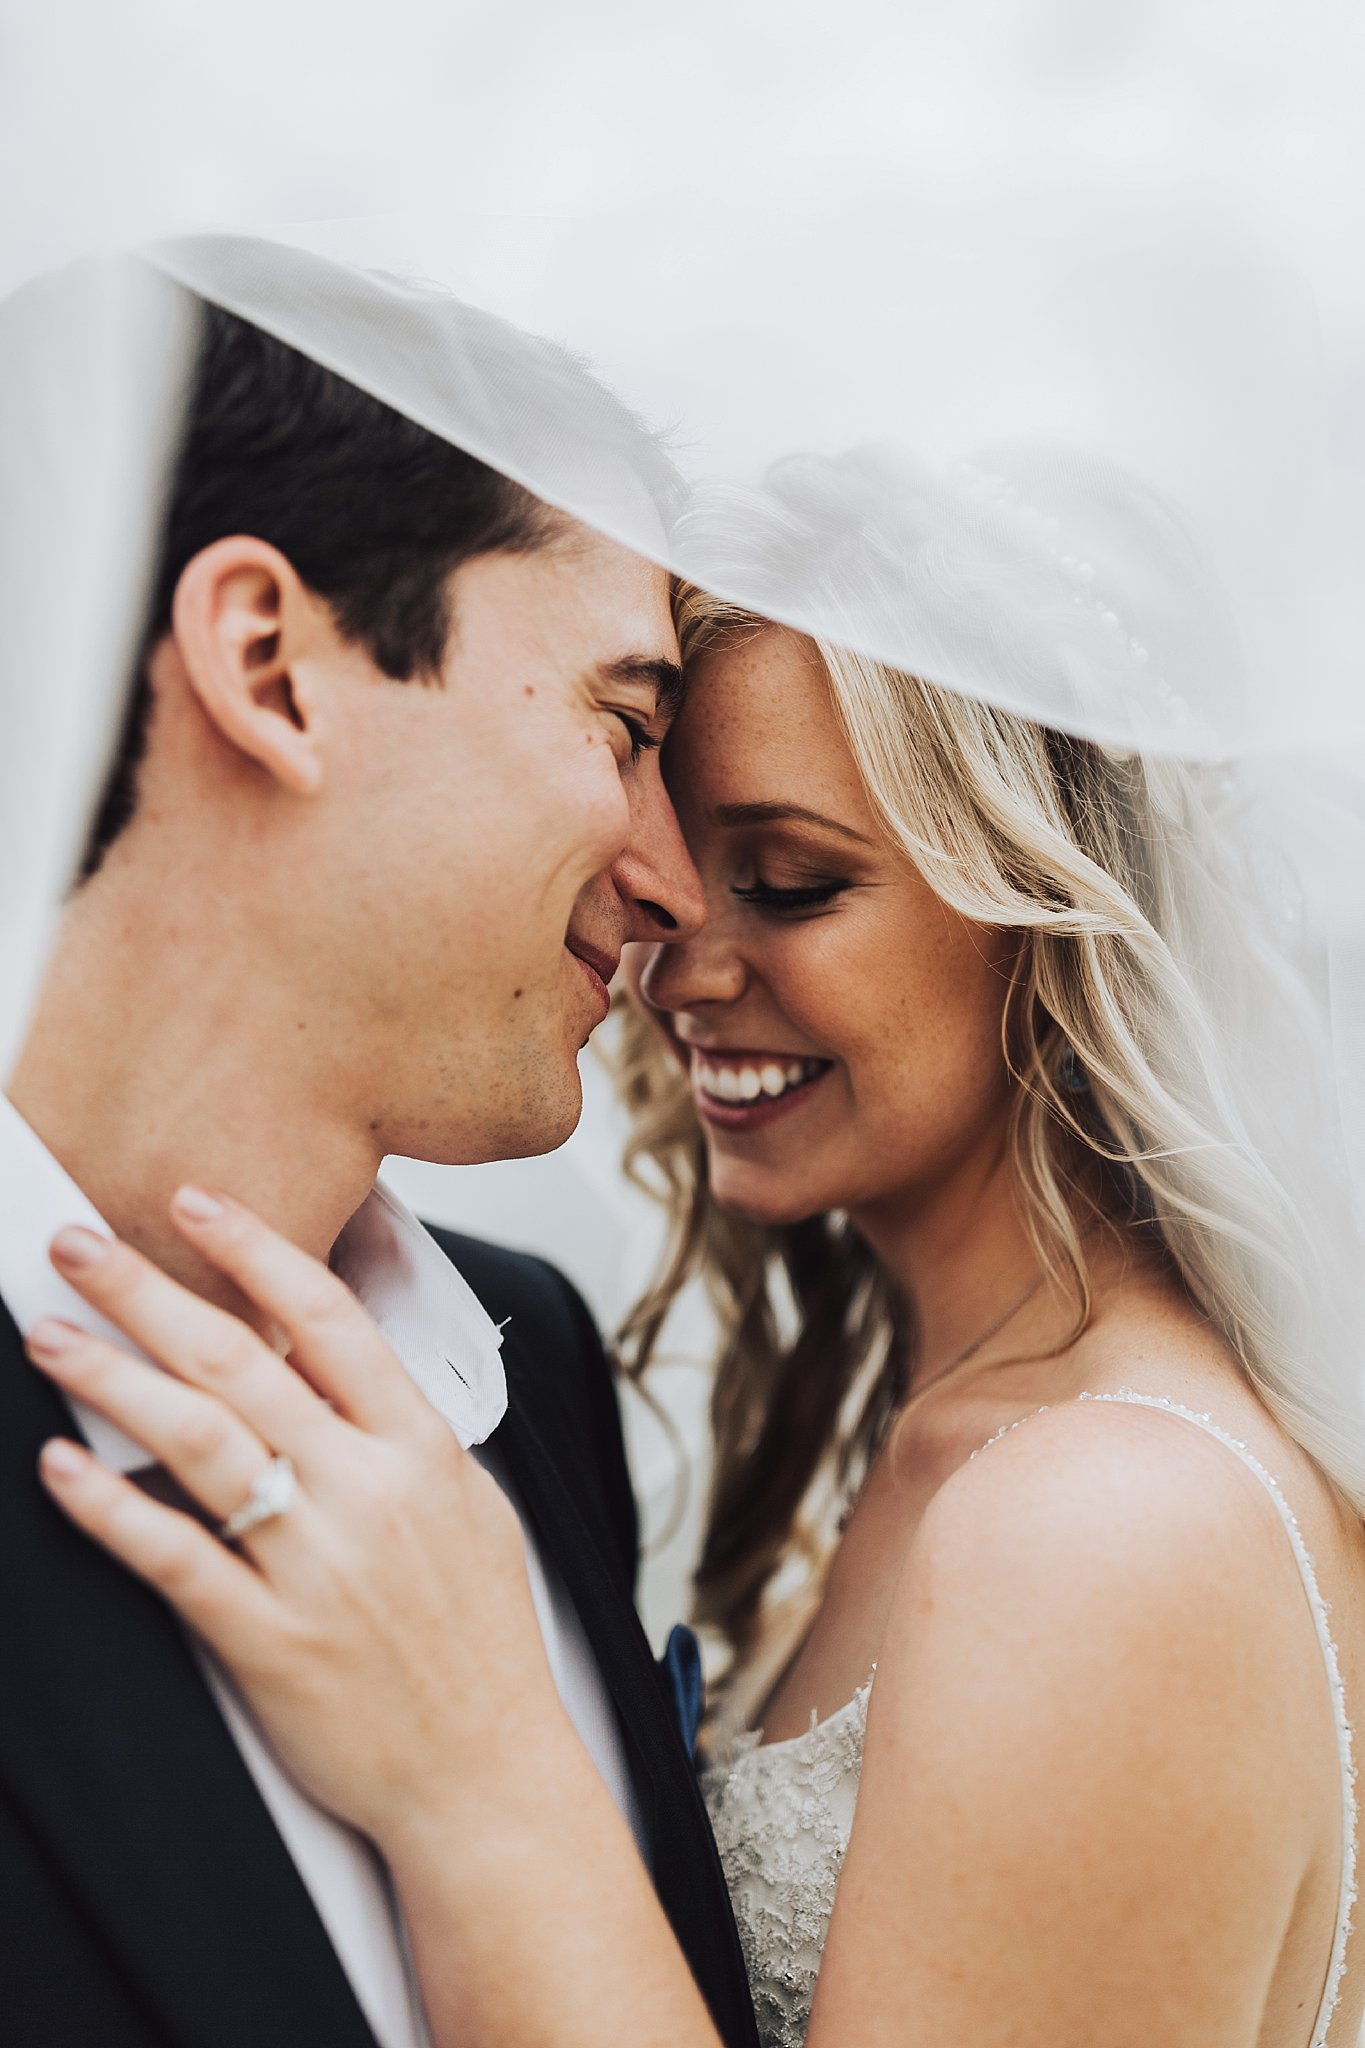 Bruid en bruidegom trouwreportage